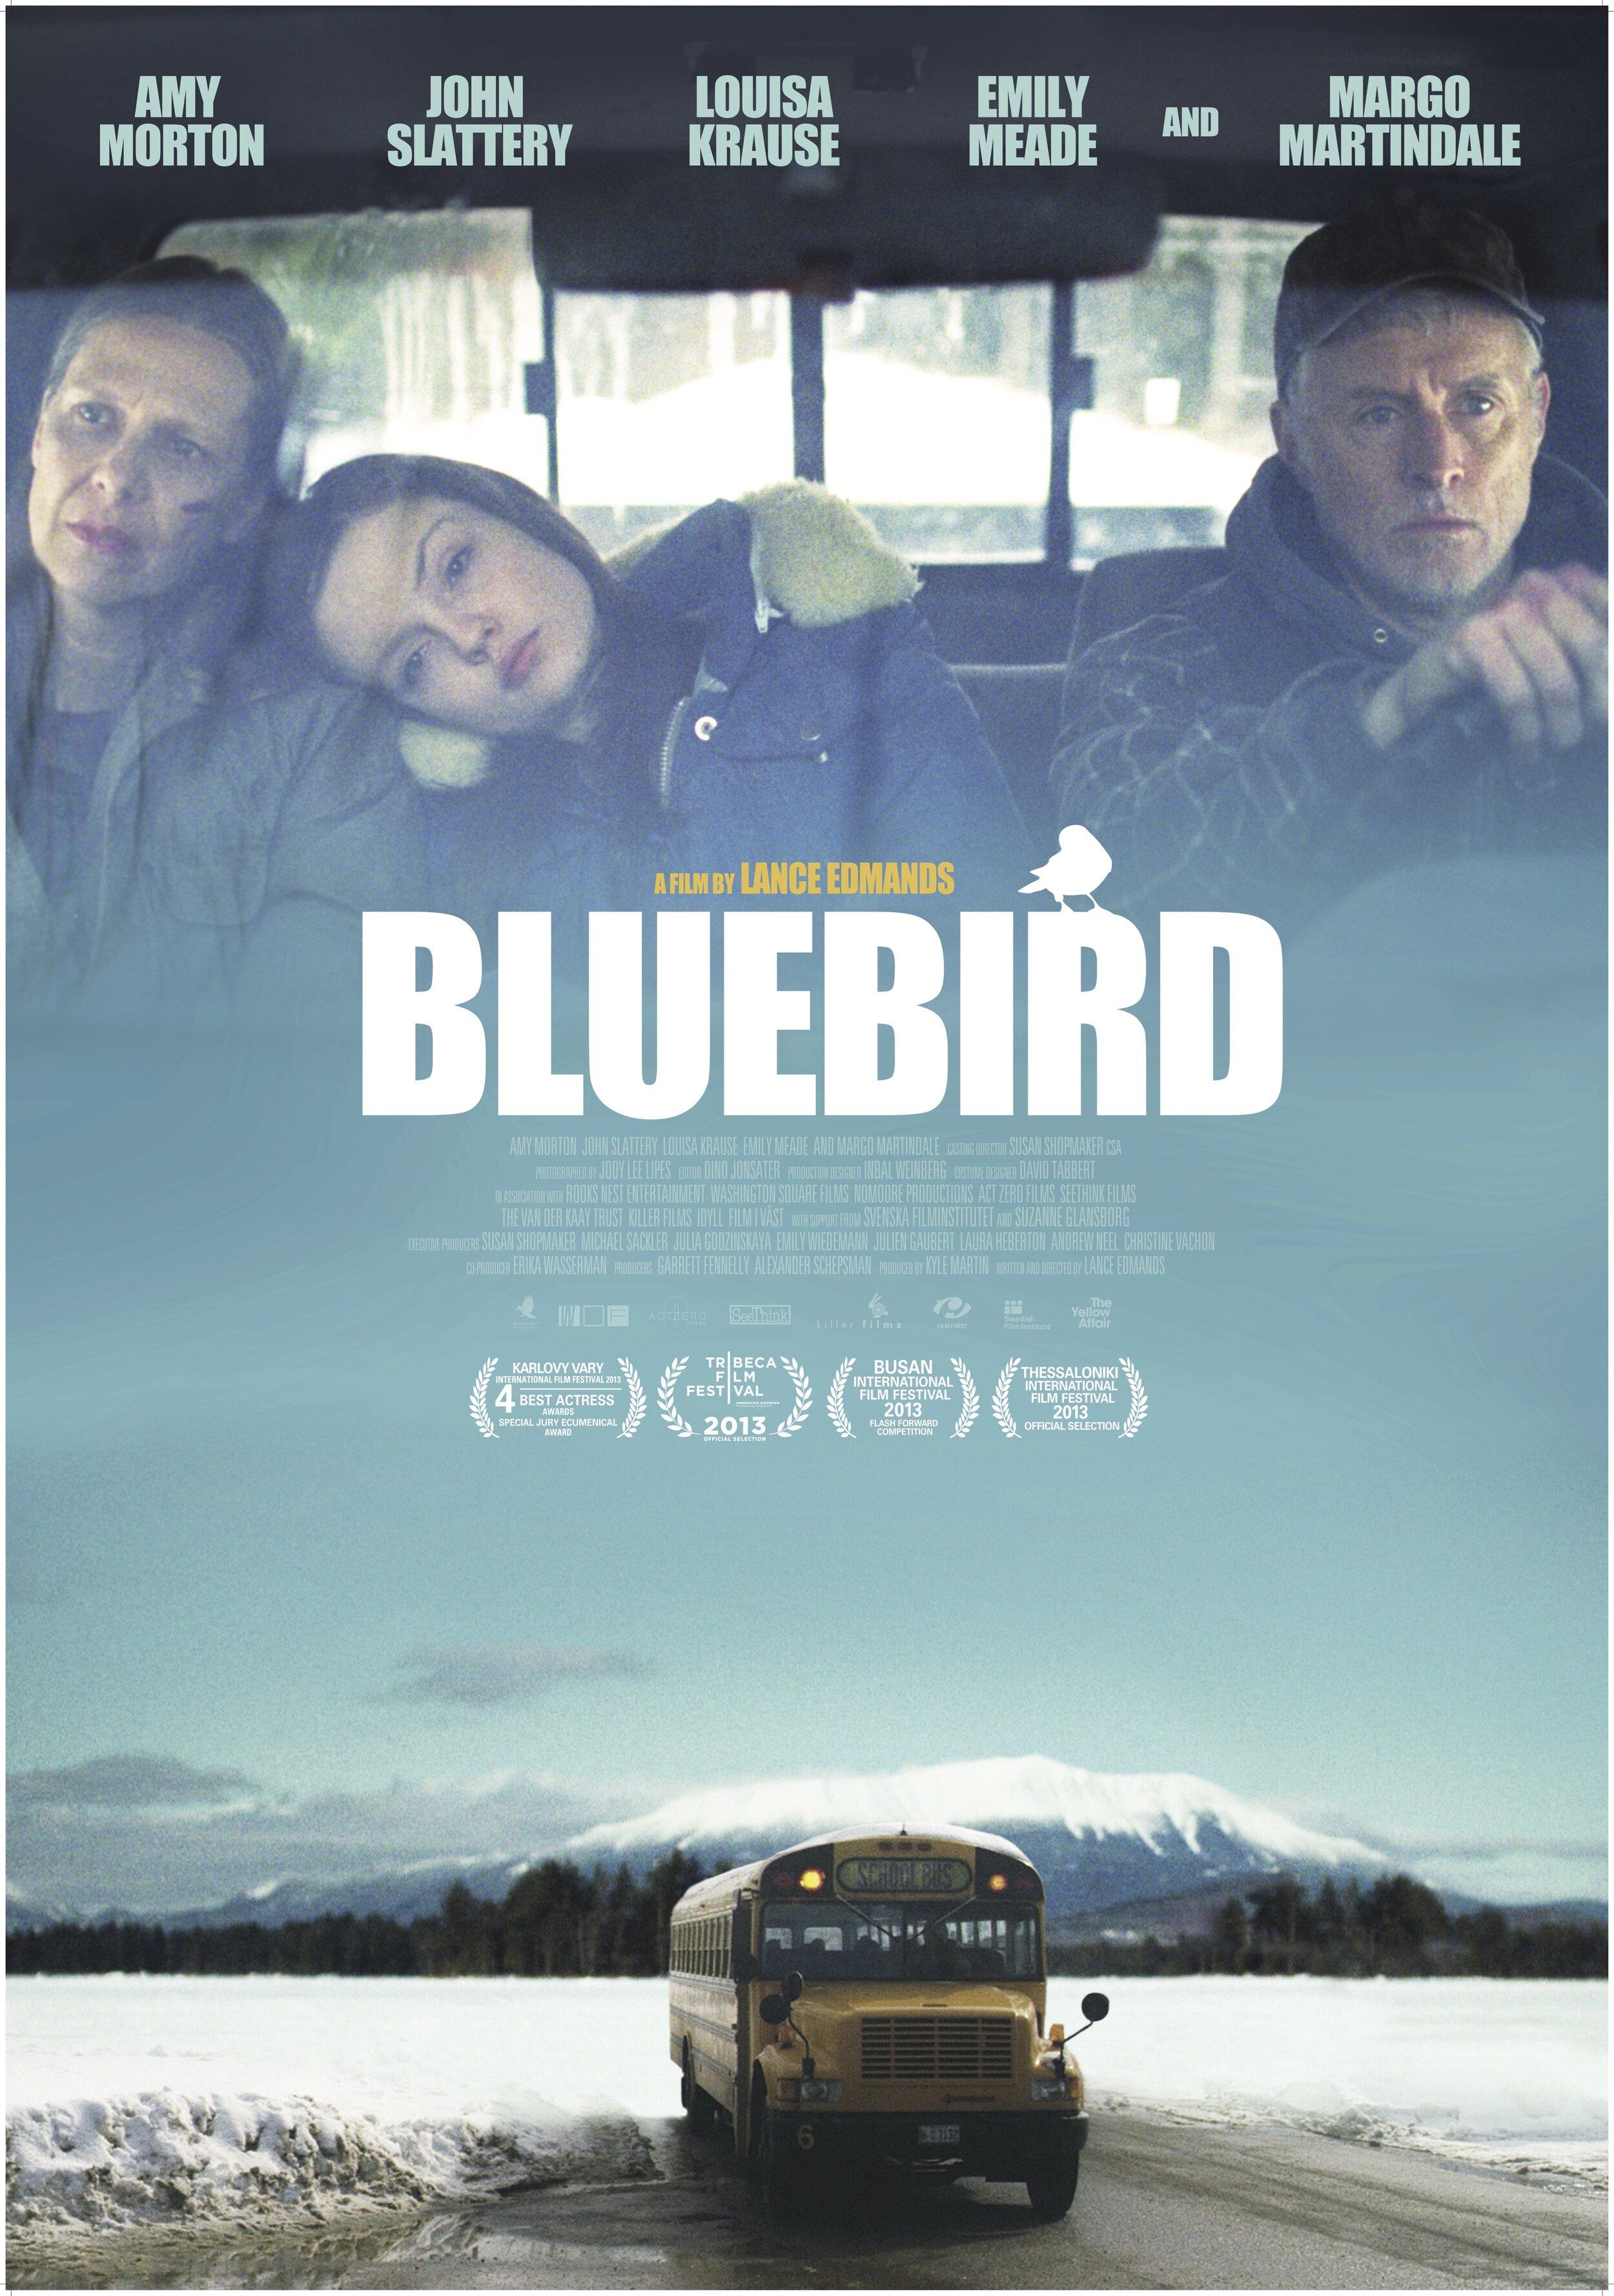 Bluebird_70x100_kjs08.jpg